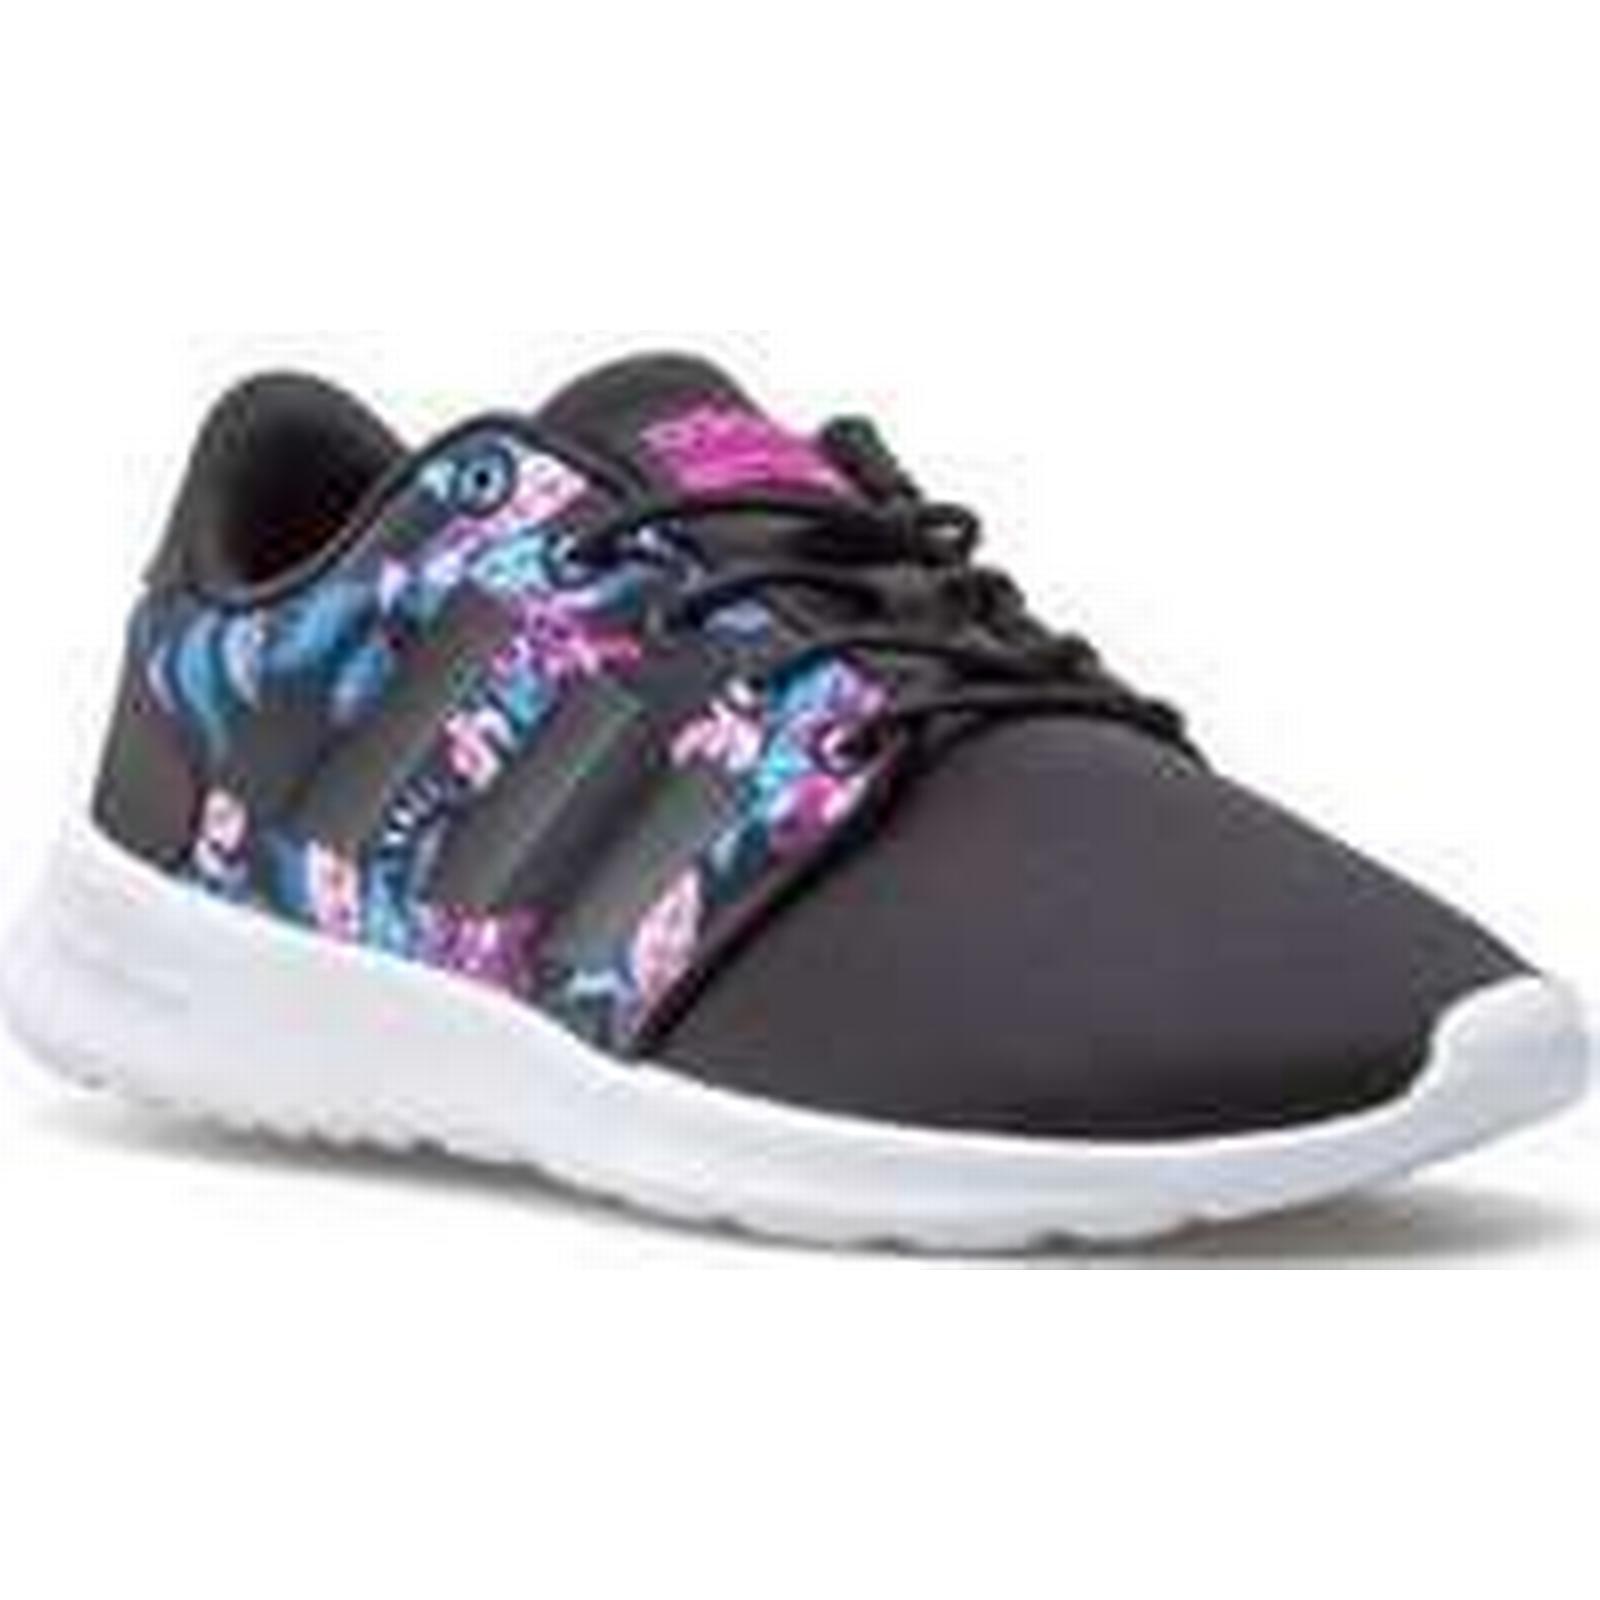 Spartoo.co.uk adidas Cloudfoam QT (Trainers) Racer W women's Shoes (Trainers) QT in Black 096e0e